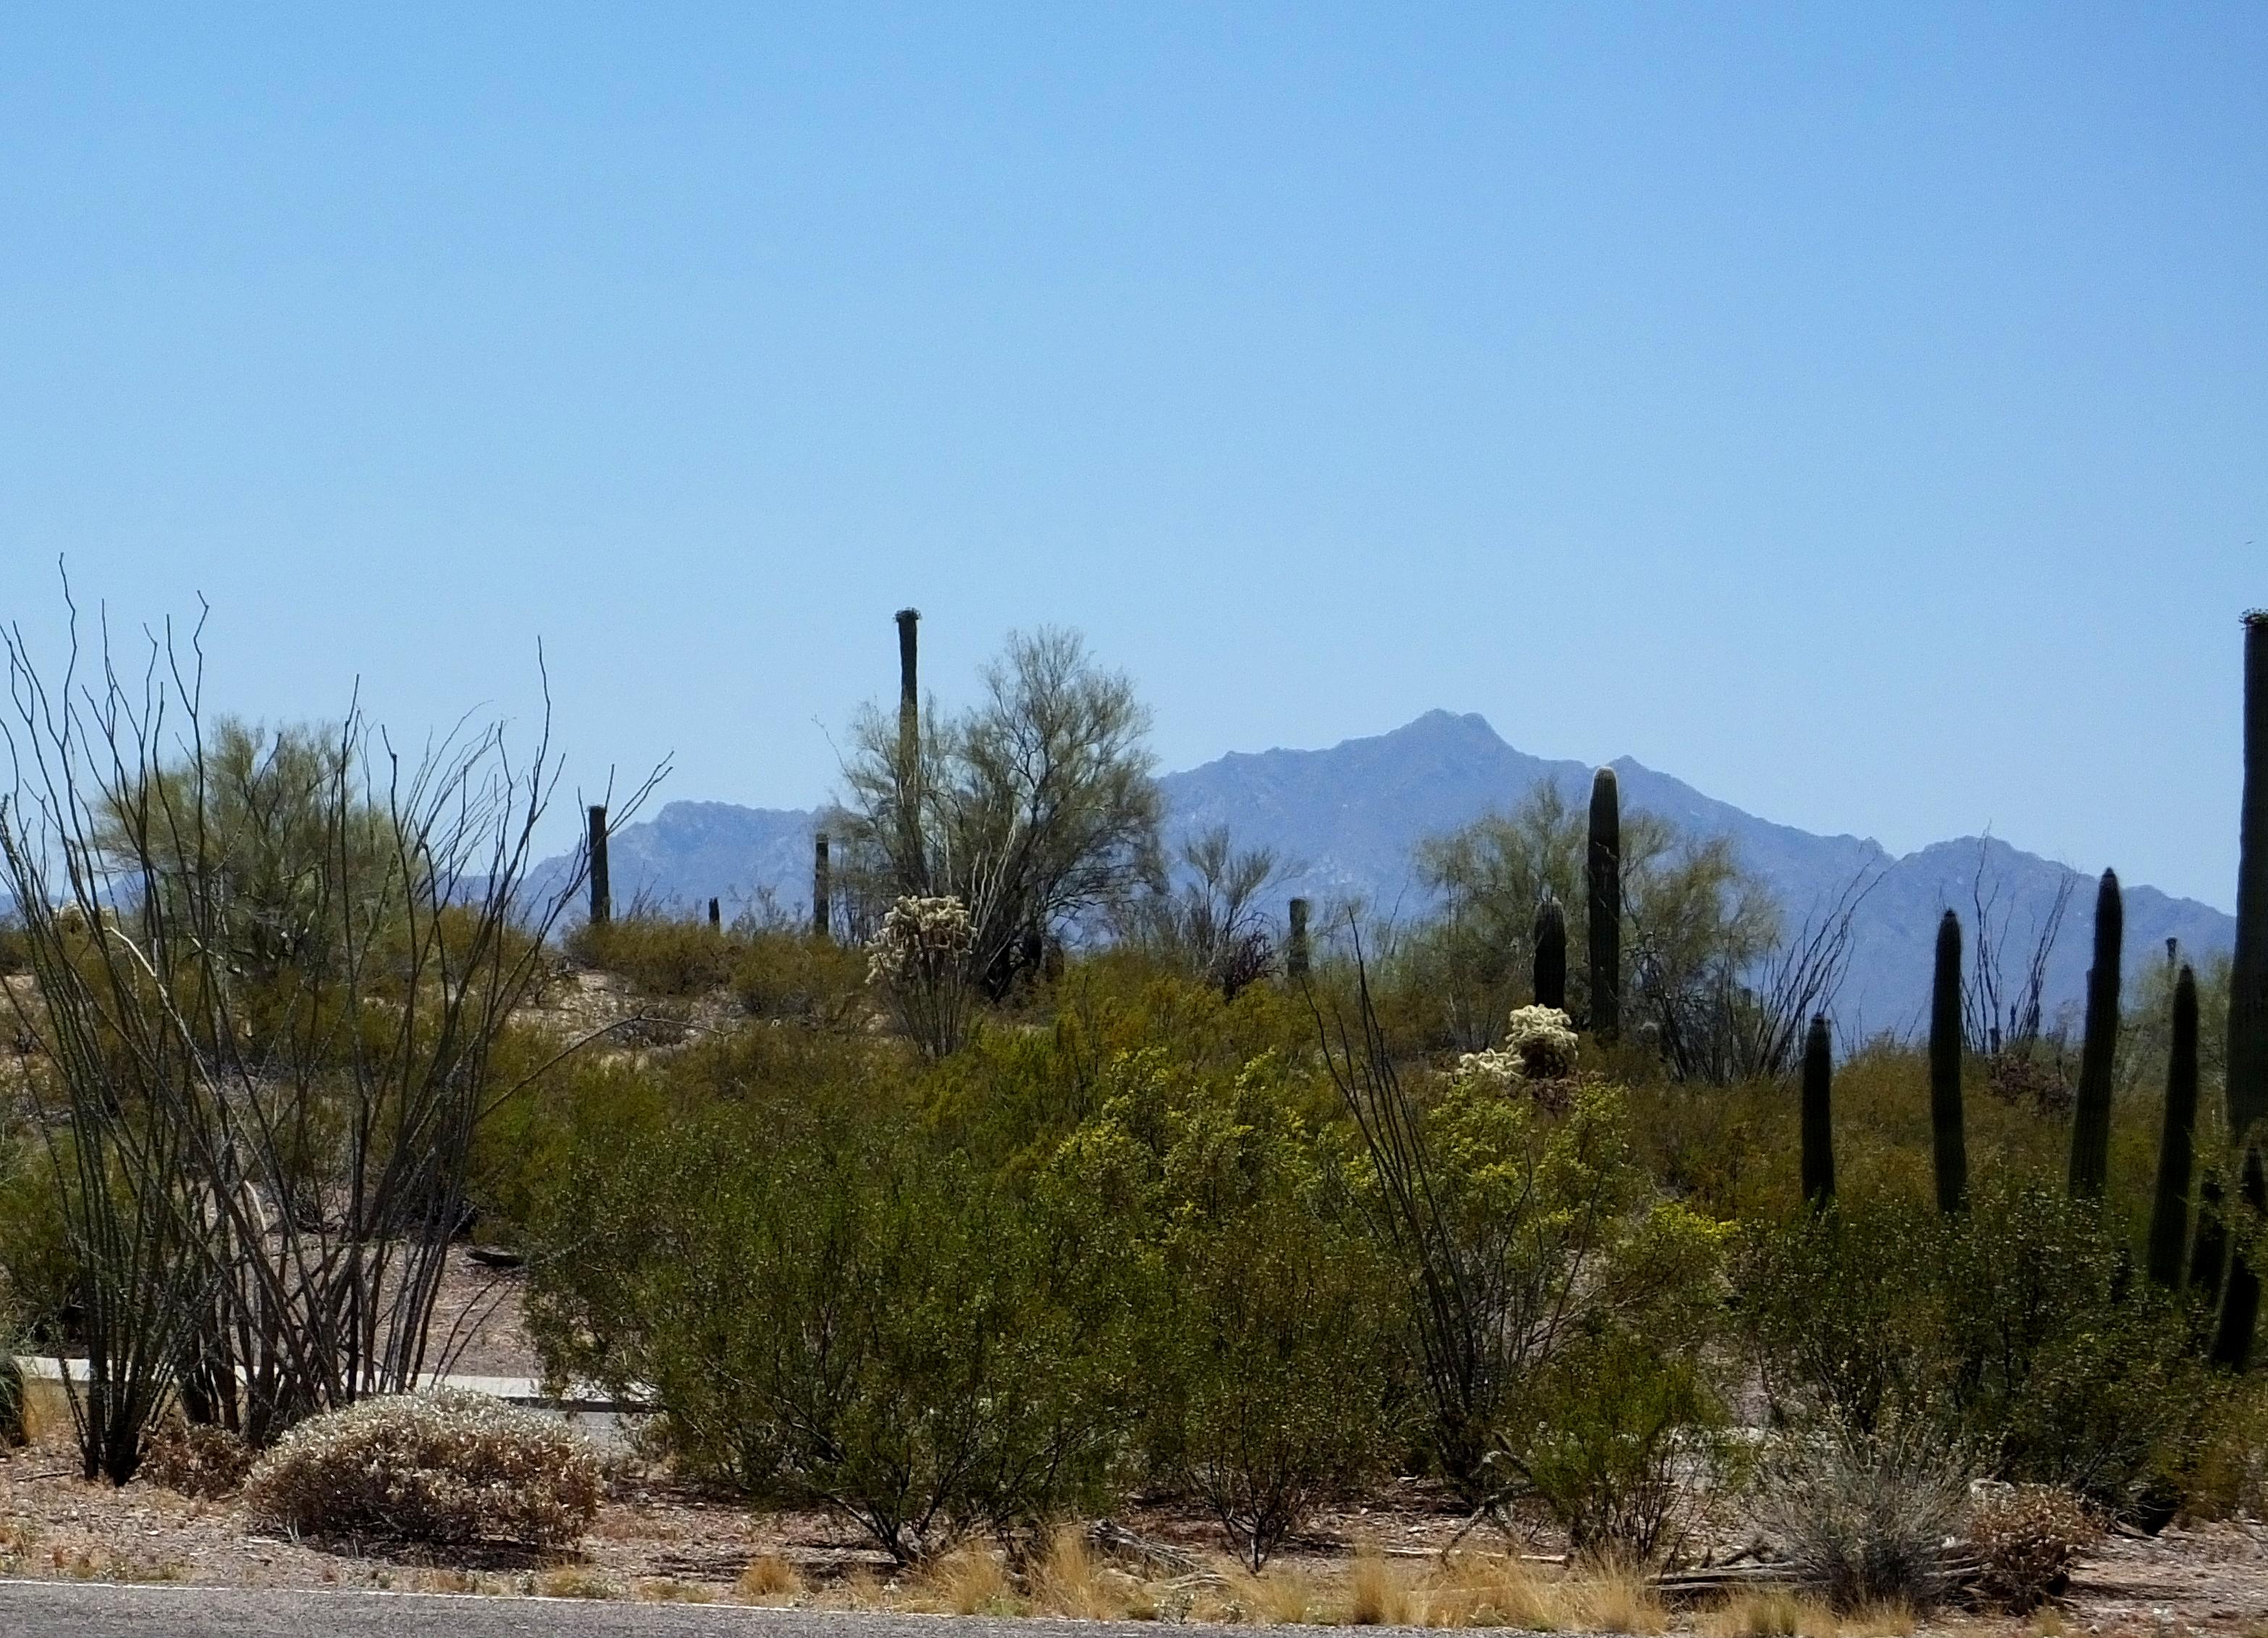 Alamo Canyon, Organ Pipe Cactus National Monument, Arizona без смс